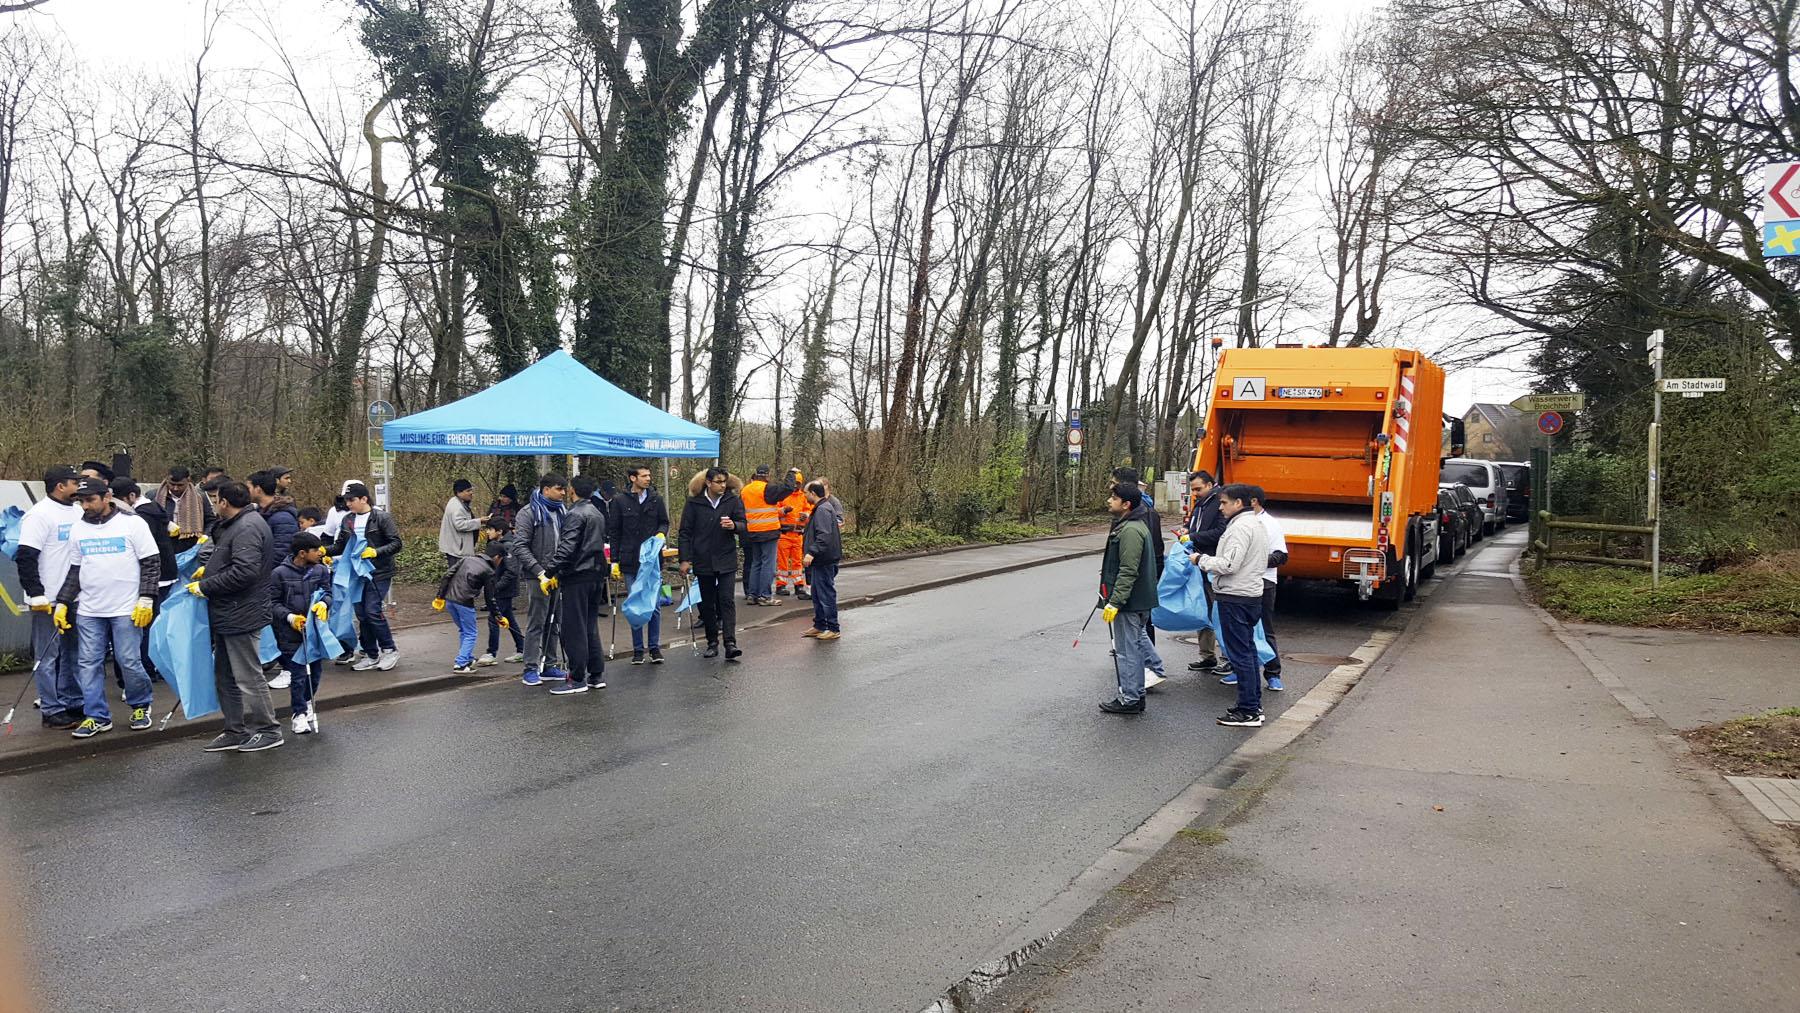 Müll Neuss teilnahme an müll weg aktion der stadt neuss ahmadiyya muslim